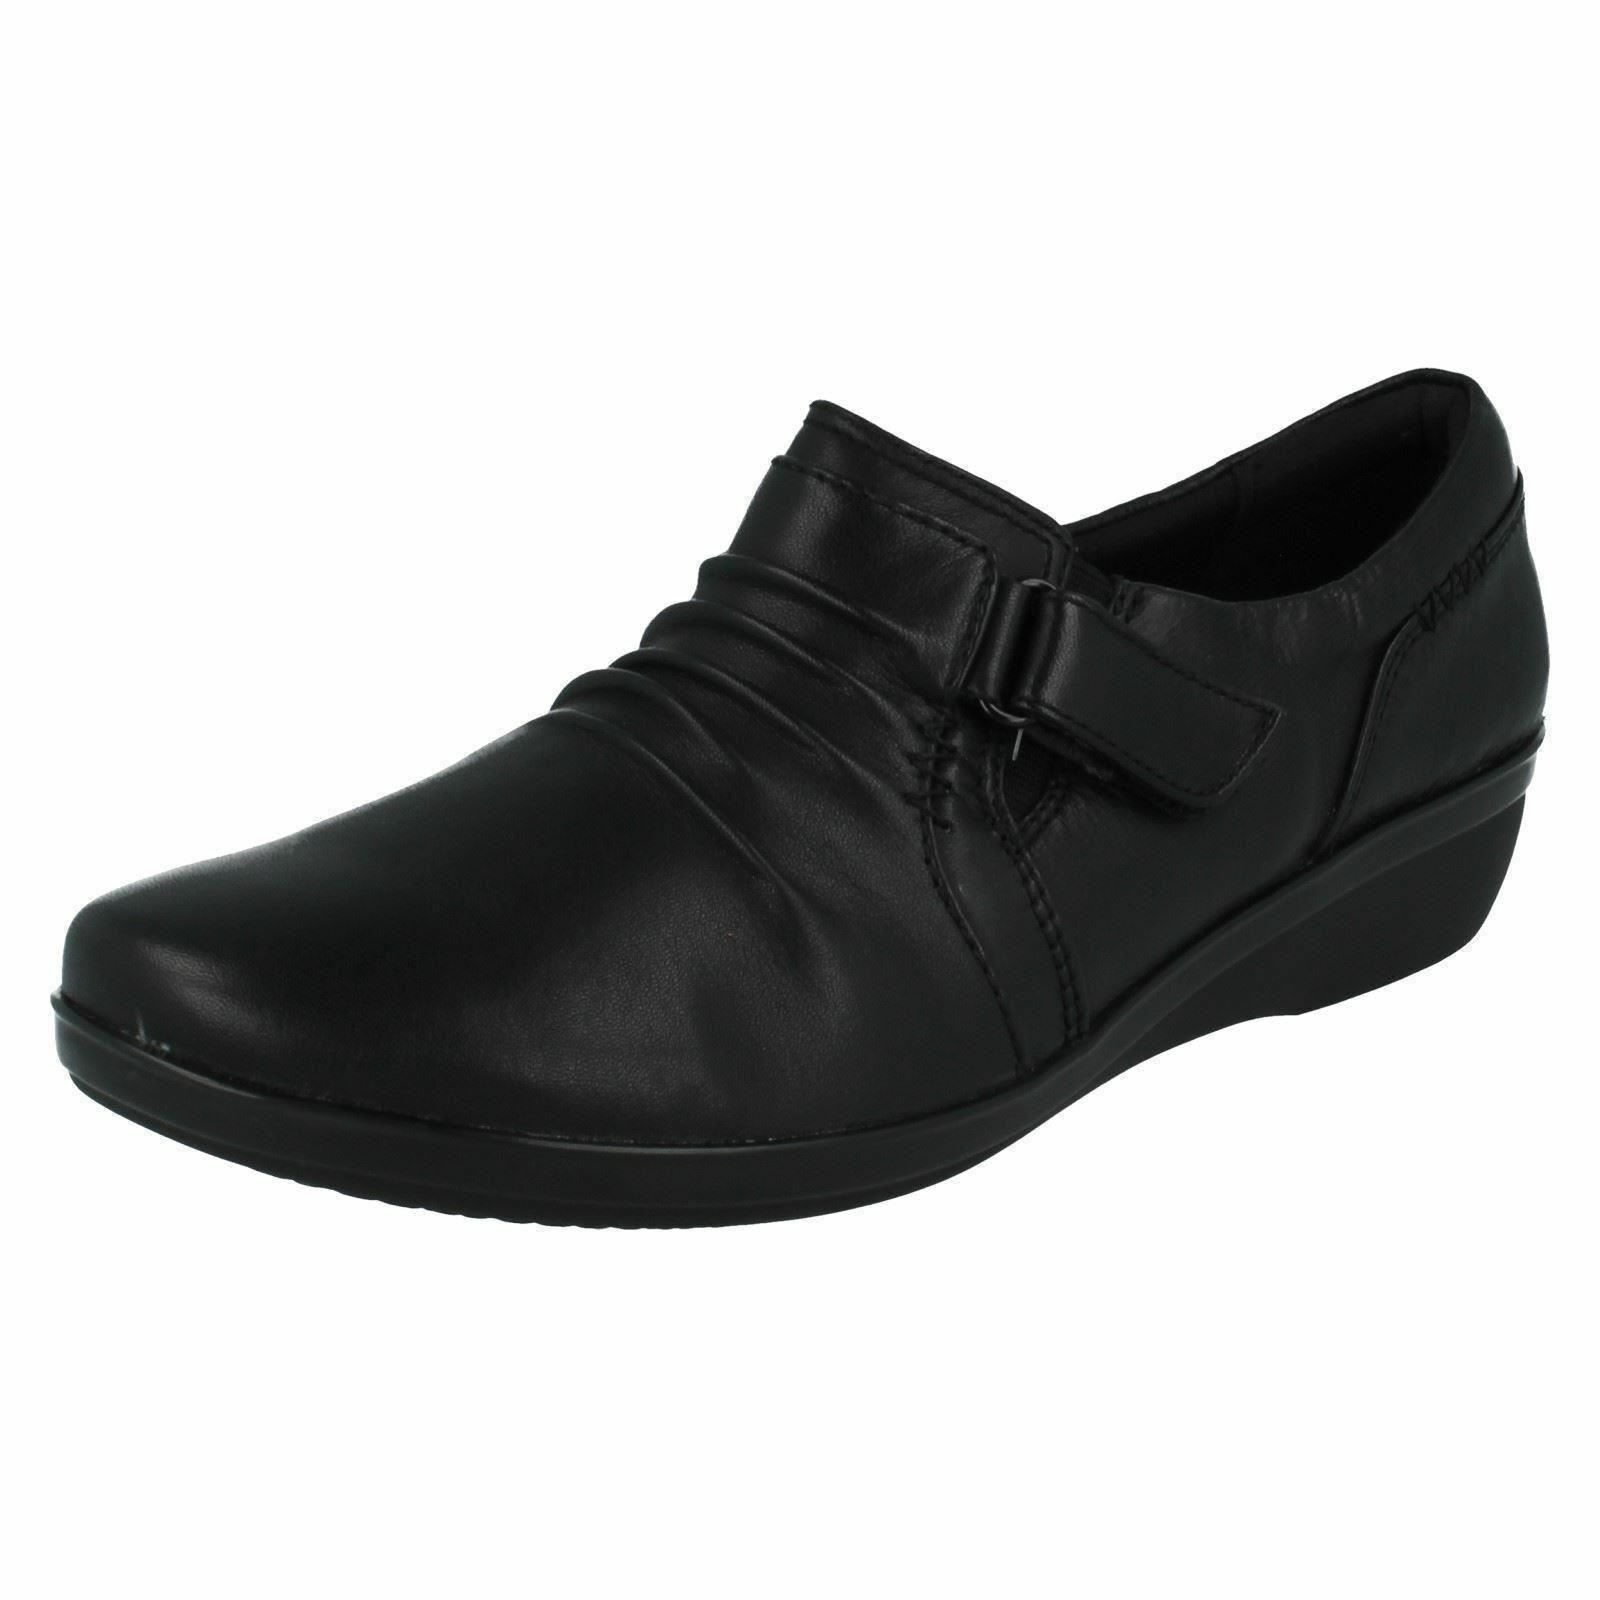 Damen Clarks Schuhe - everlay Coda